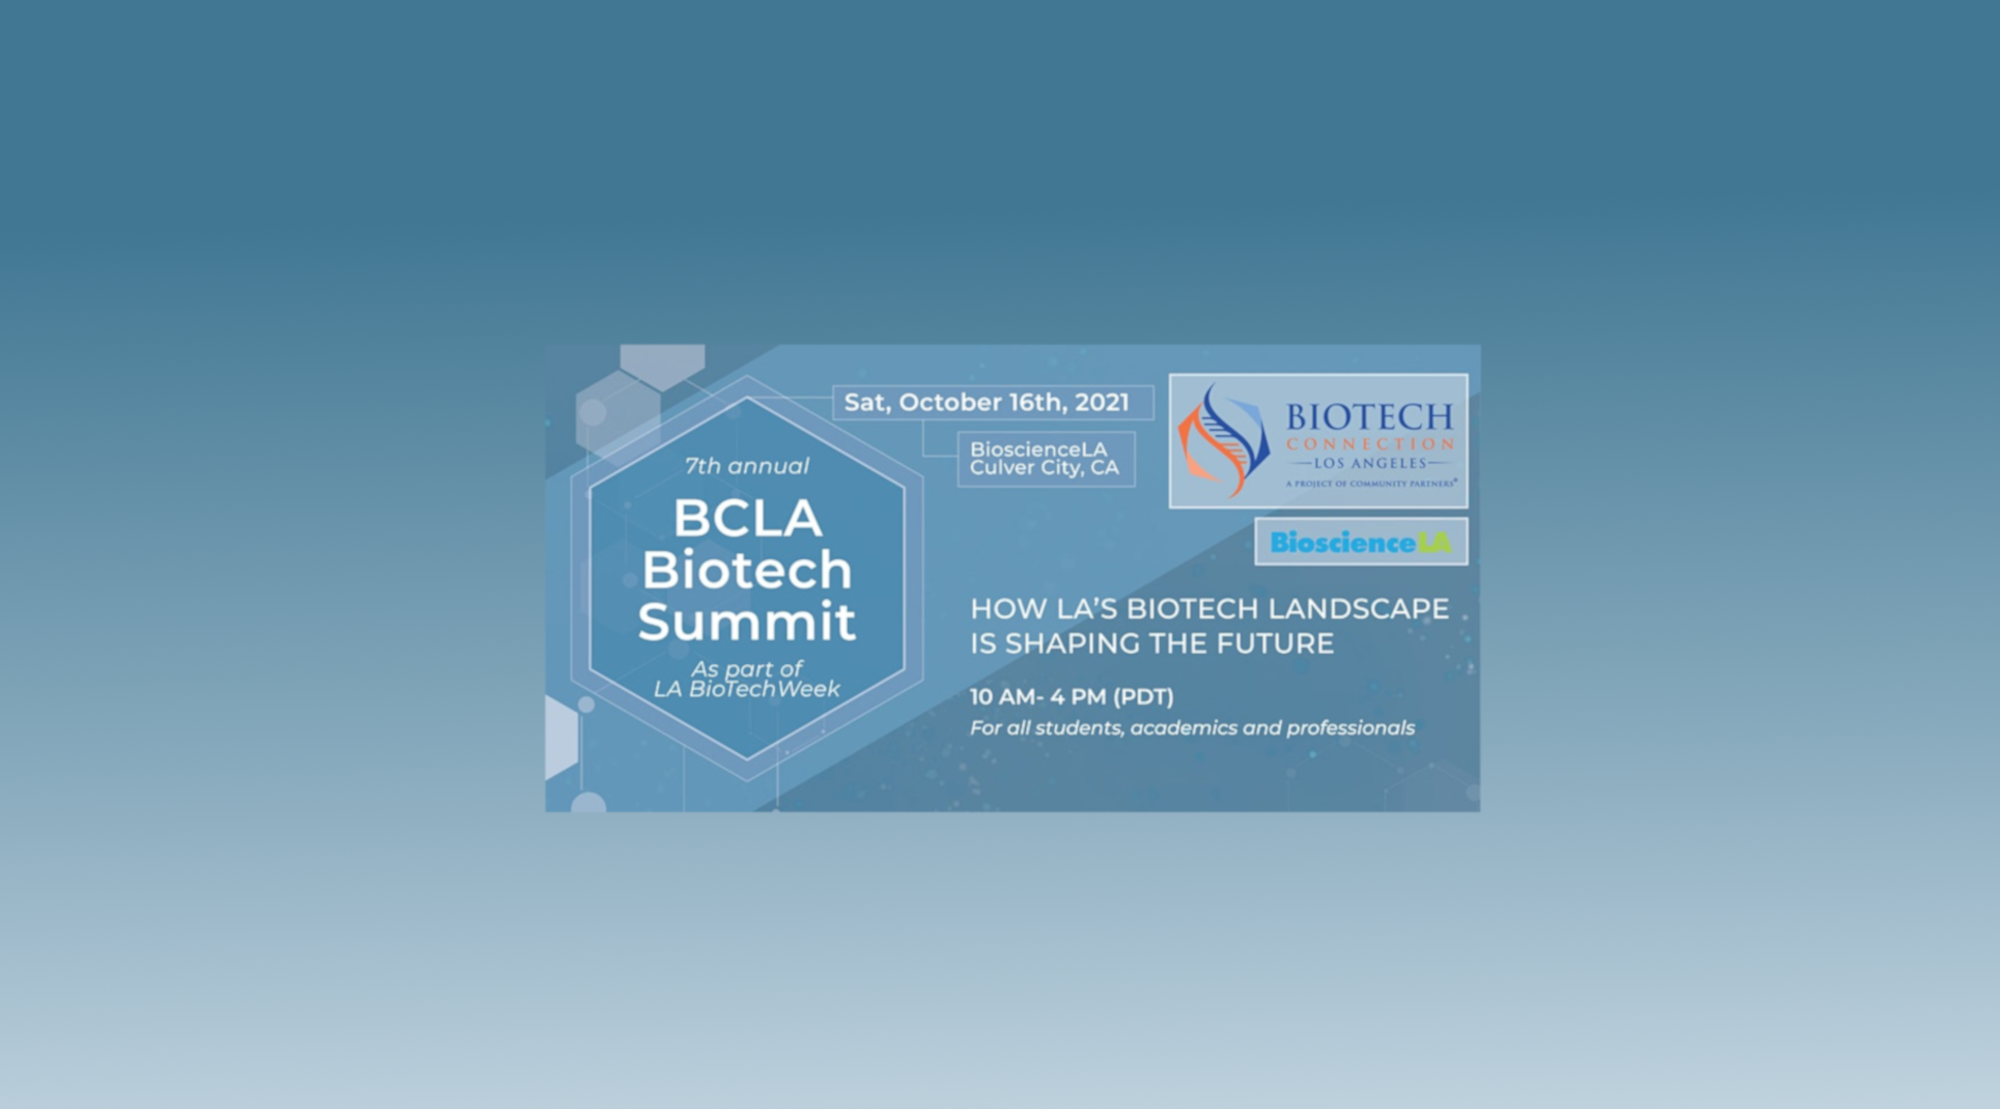 BCLA's 7th Annual Biotech Summit